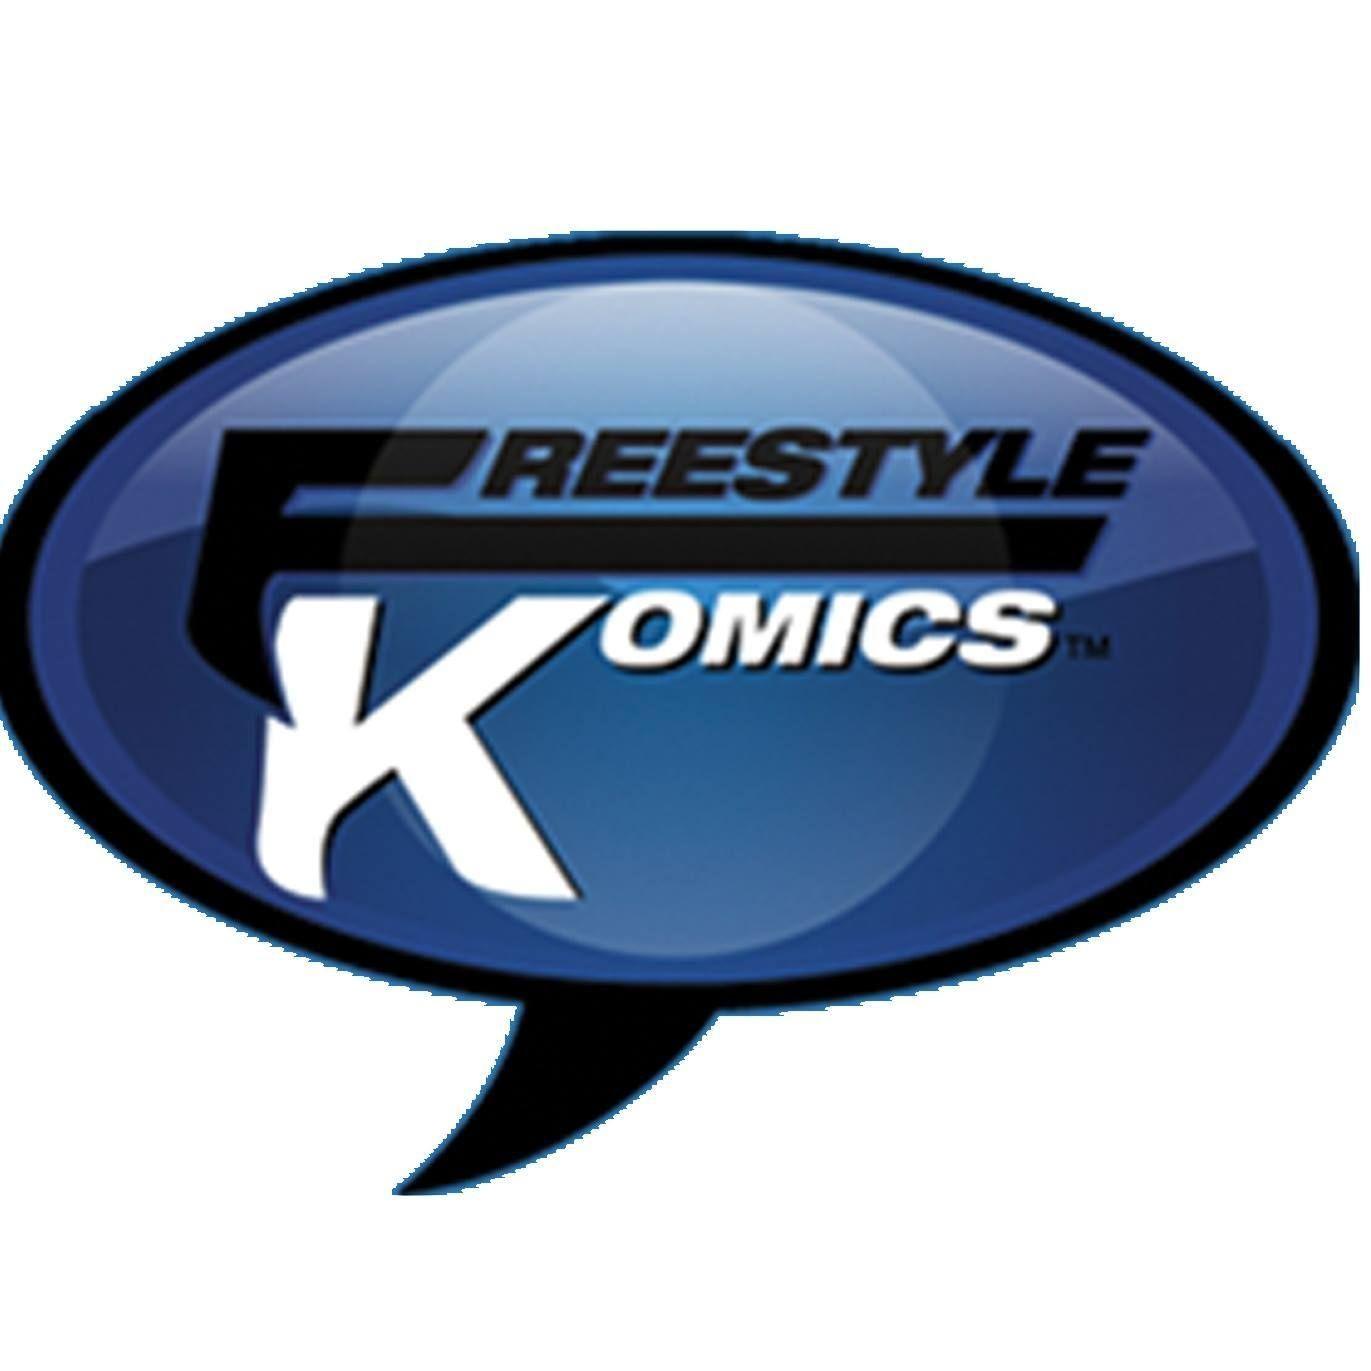 Freestyle Komics Logo